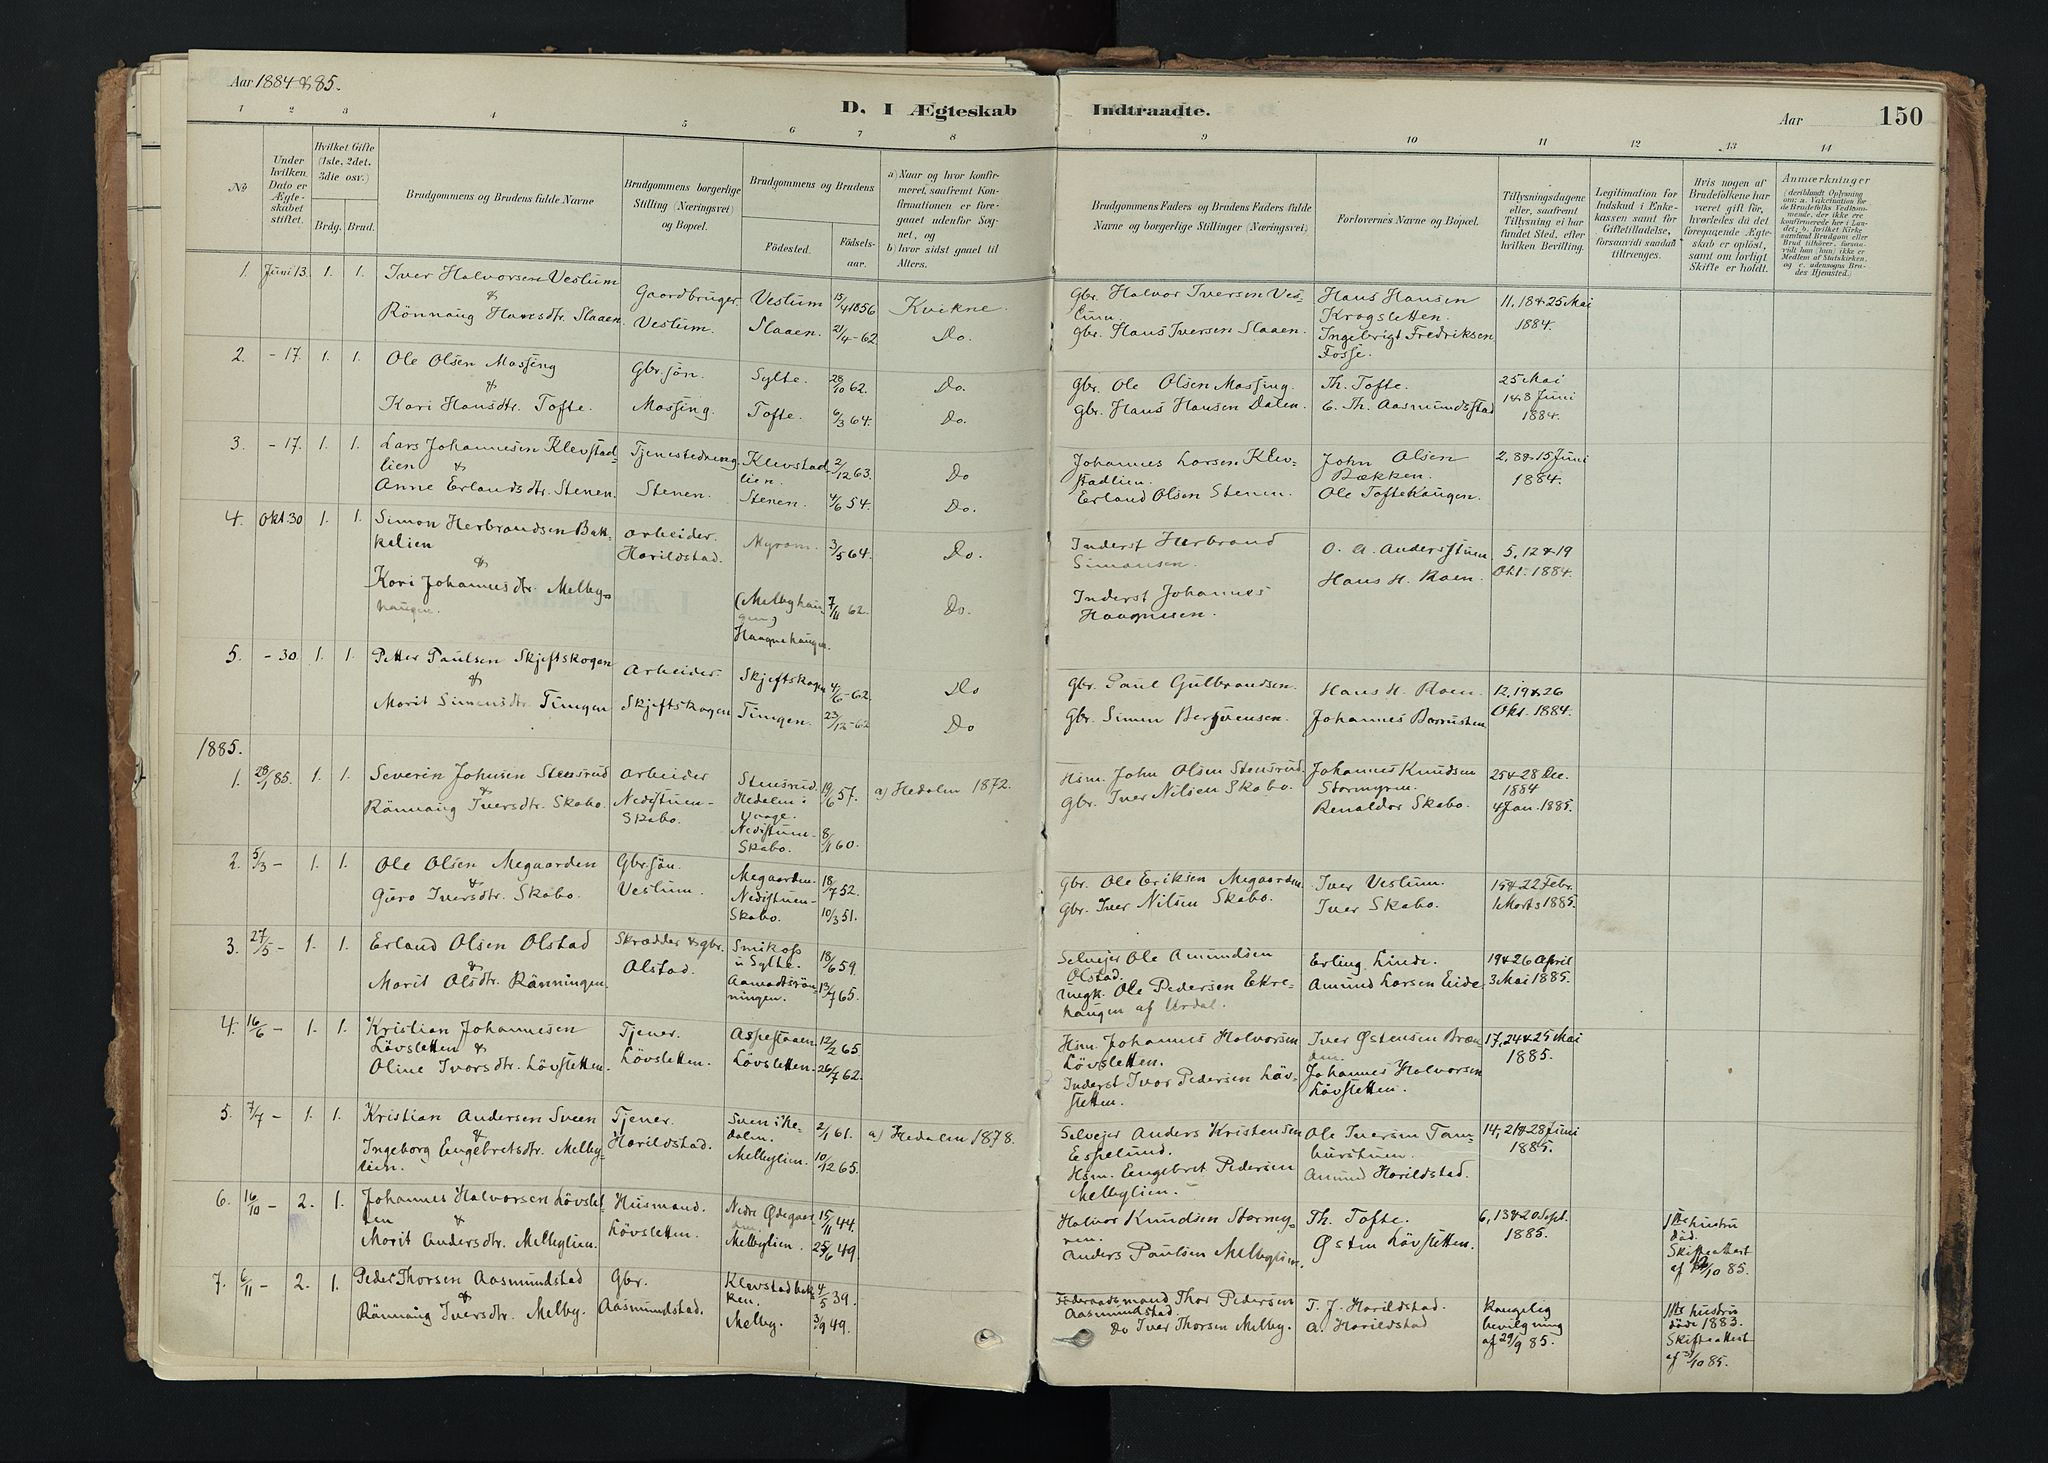 SAH, Nord-Fron prestekontor, Ministerialbok nr. 5, 1884-1914, s. 150